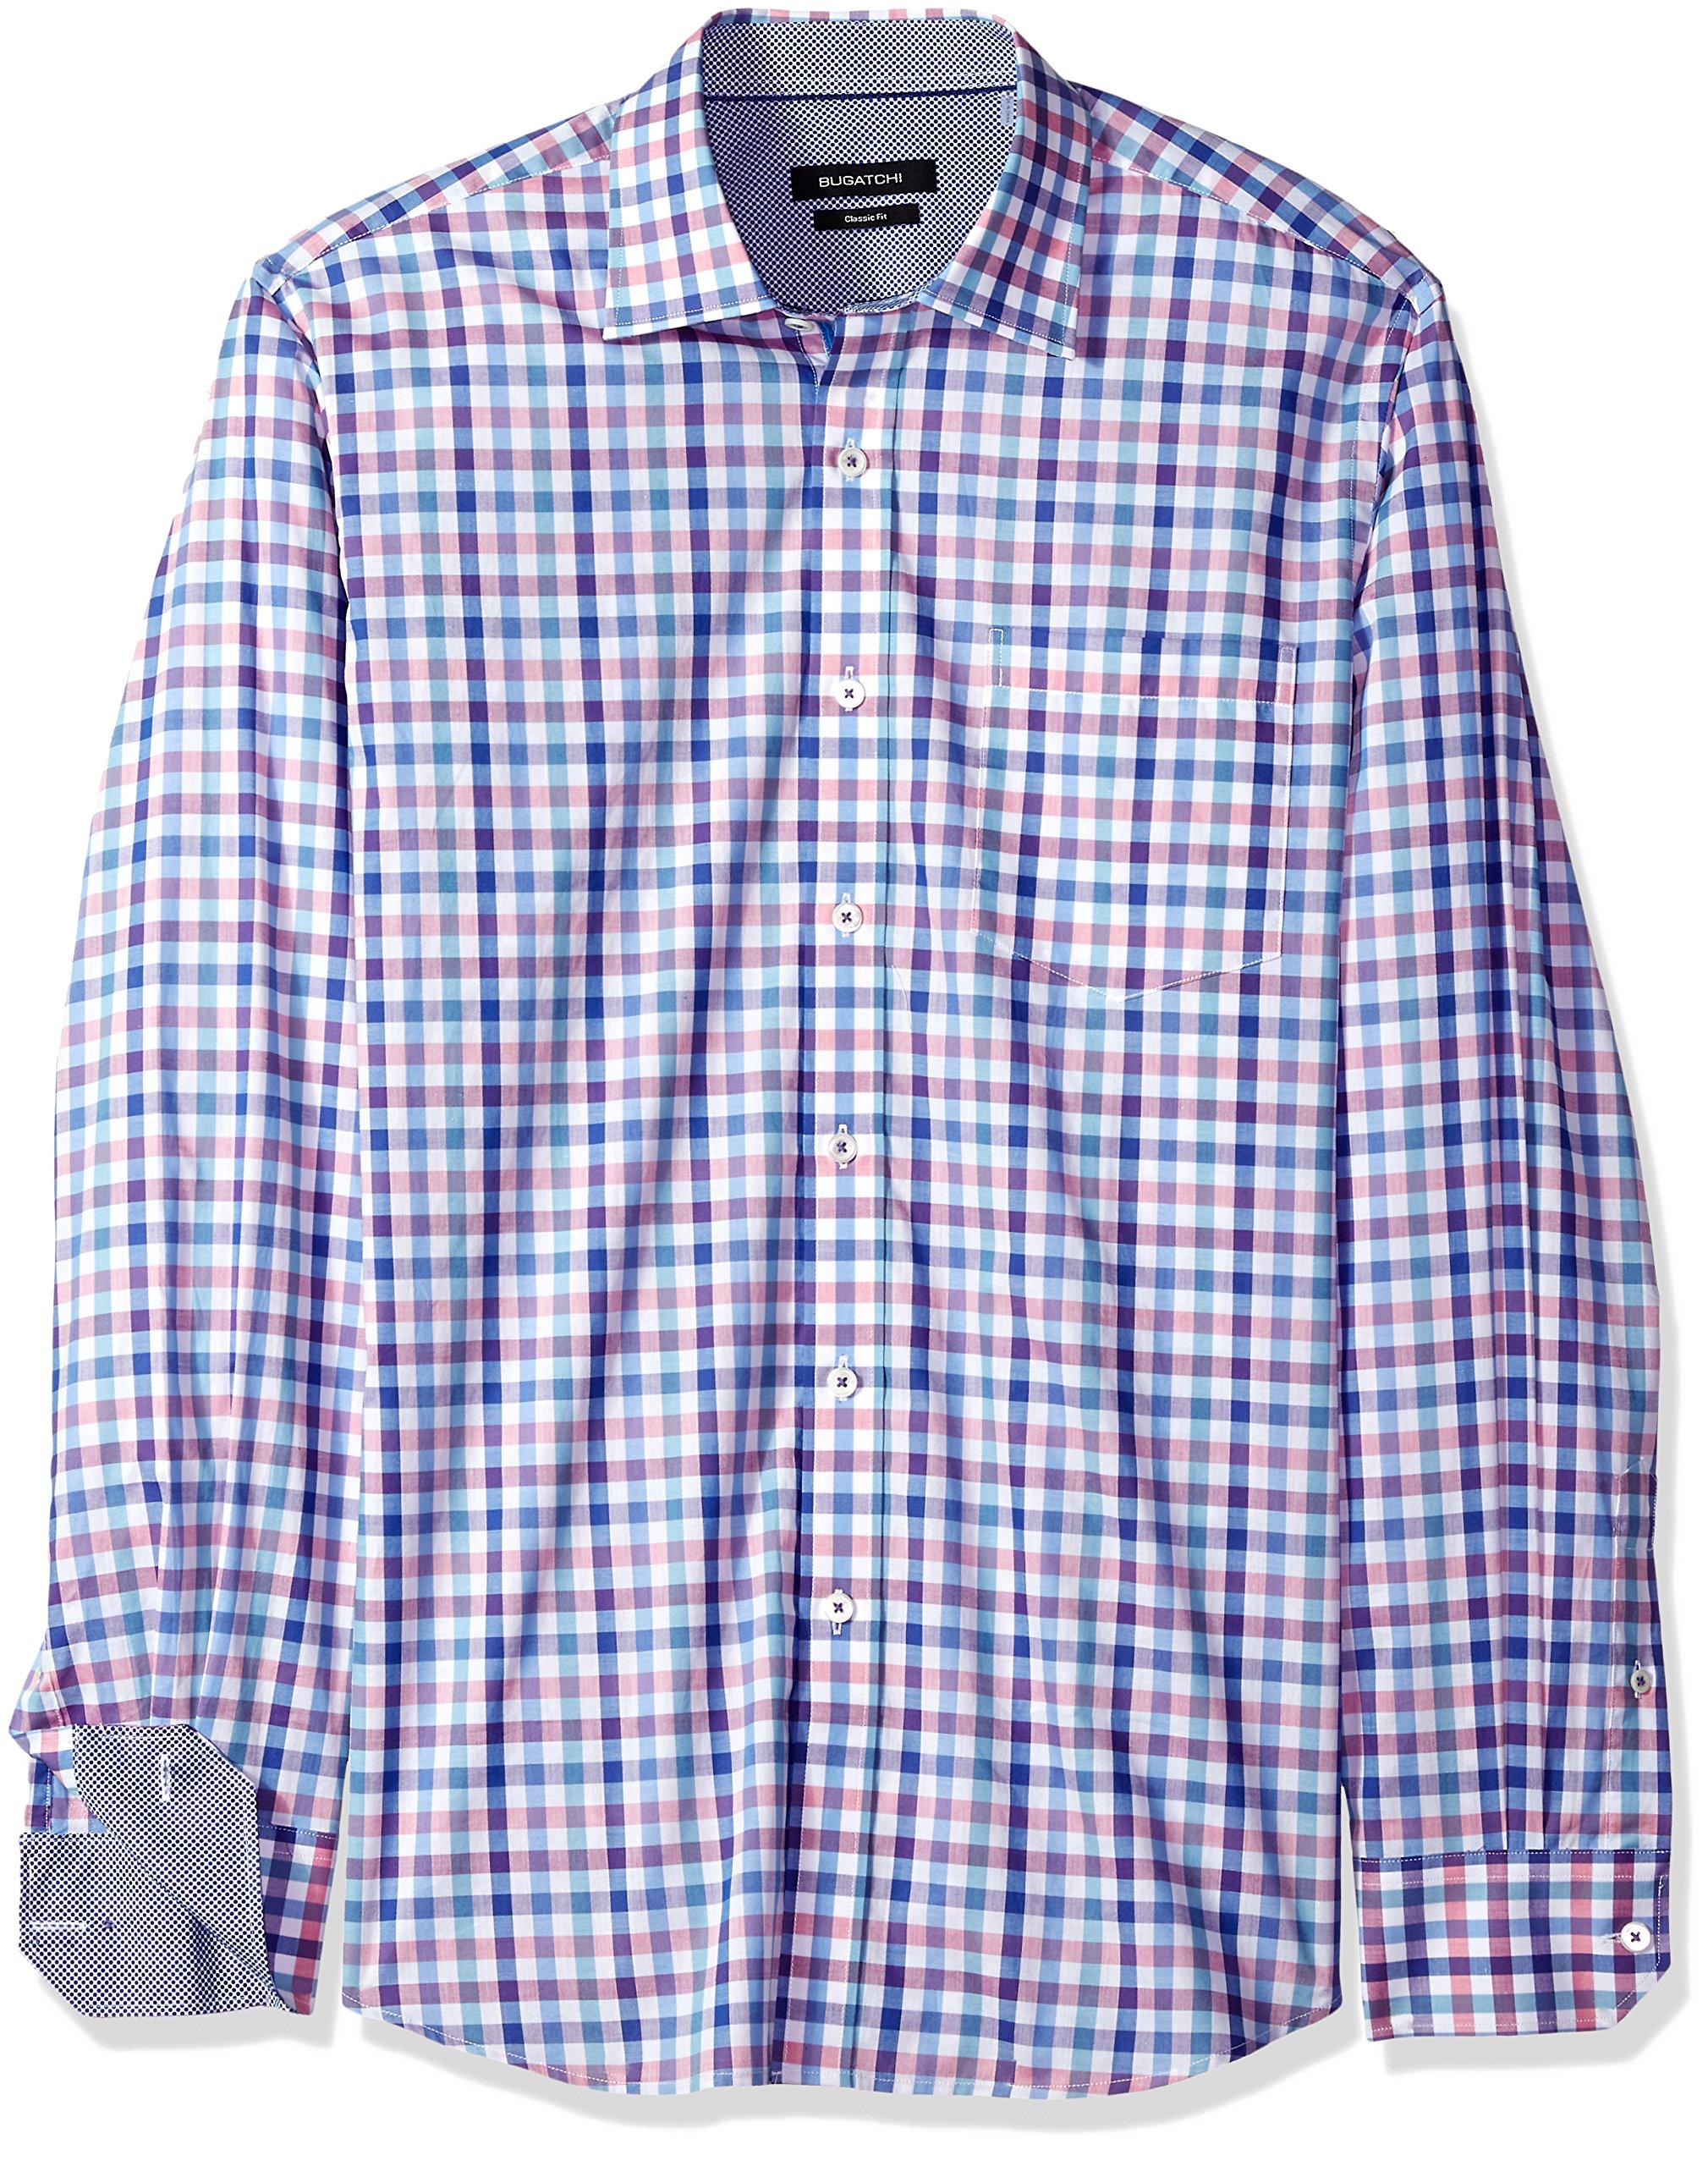 Bugatchi Men's Cotton Print Classic Fit Long Sleeve Point Collar Shirt, Classic Blue, XL by Bugatchi (Image #1)